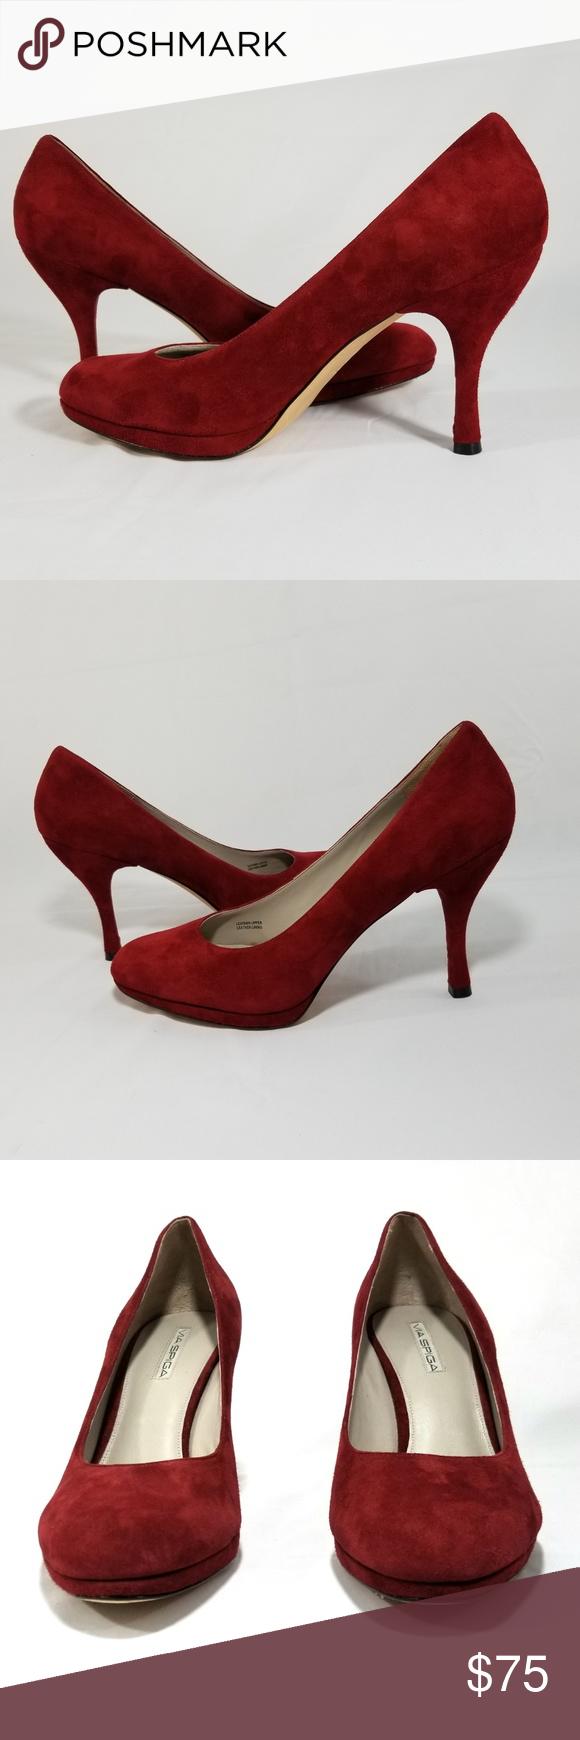 3788797853f3 Via Spiga Red Suede Pumps Round Toe Womens Size 11 Absolutely gorgeous Via  Spiga Red Suede Pumps Round Toe and 4